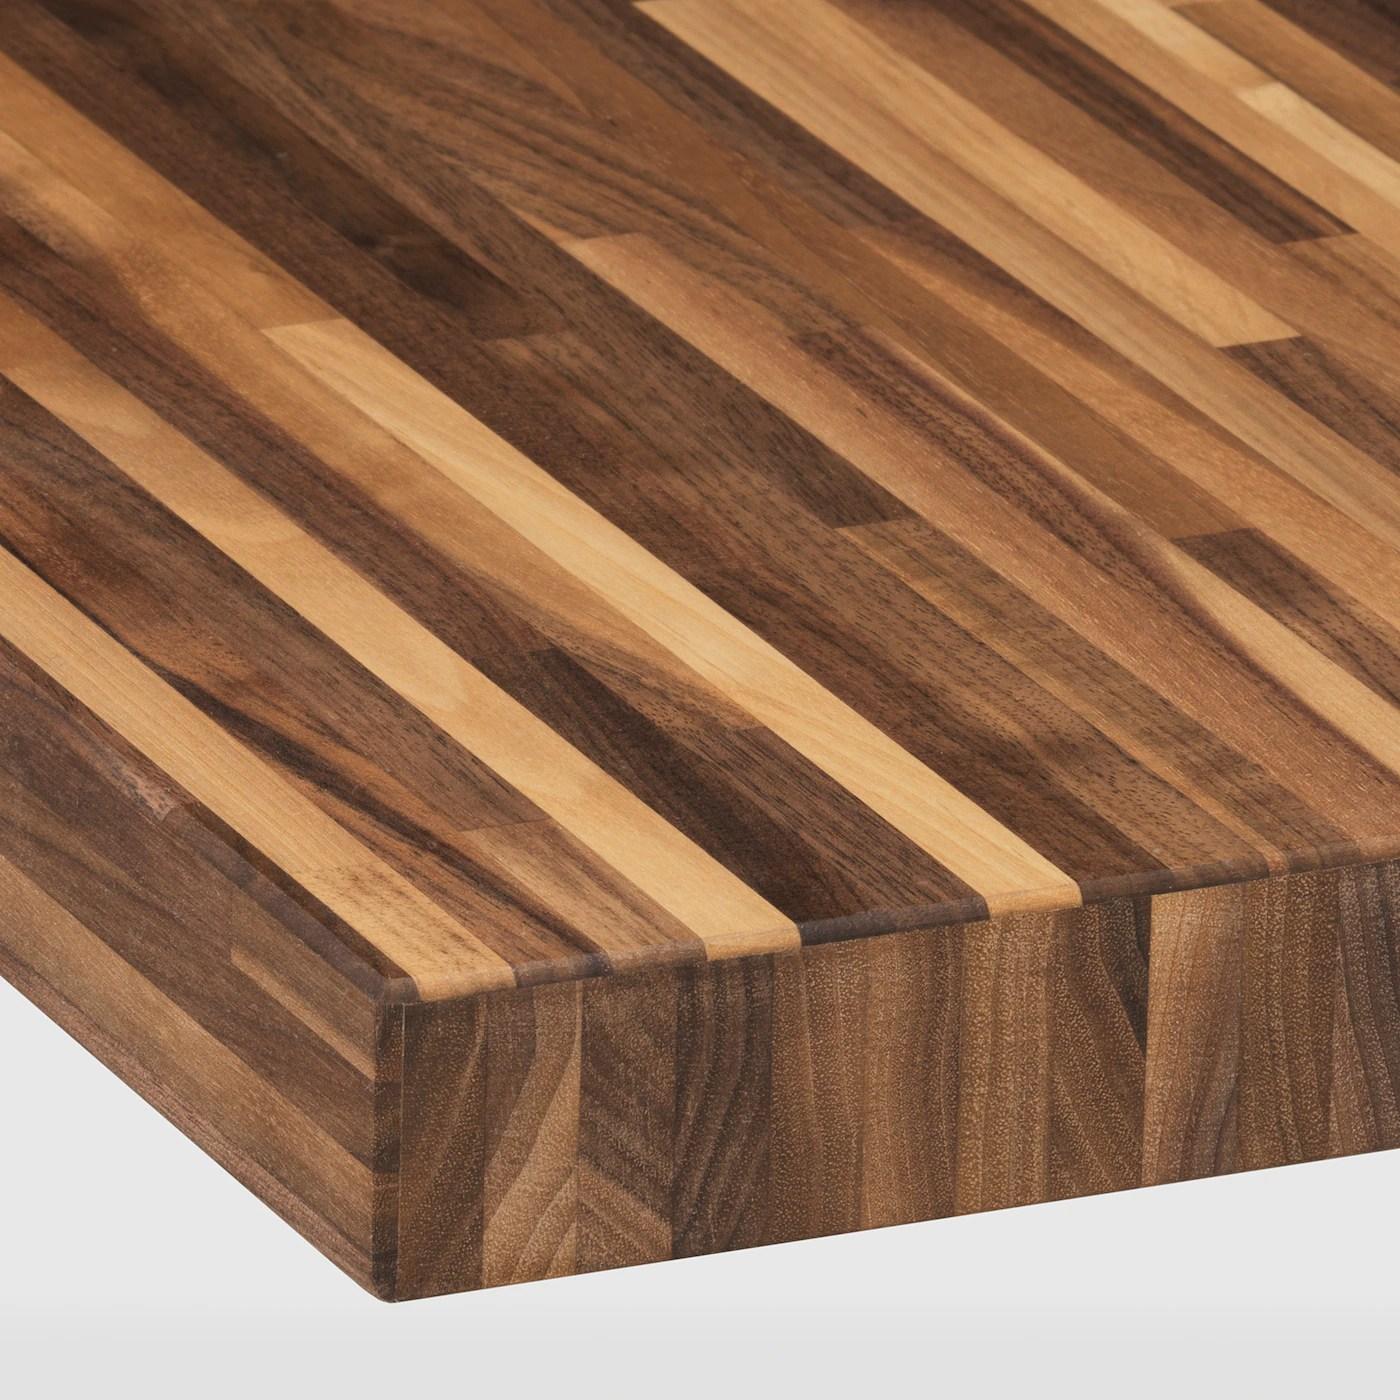 Pinnarp Plan De Travail Noyer Plaque 246x3 Ikea